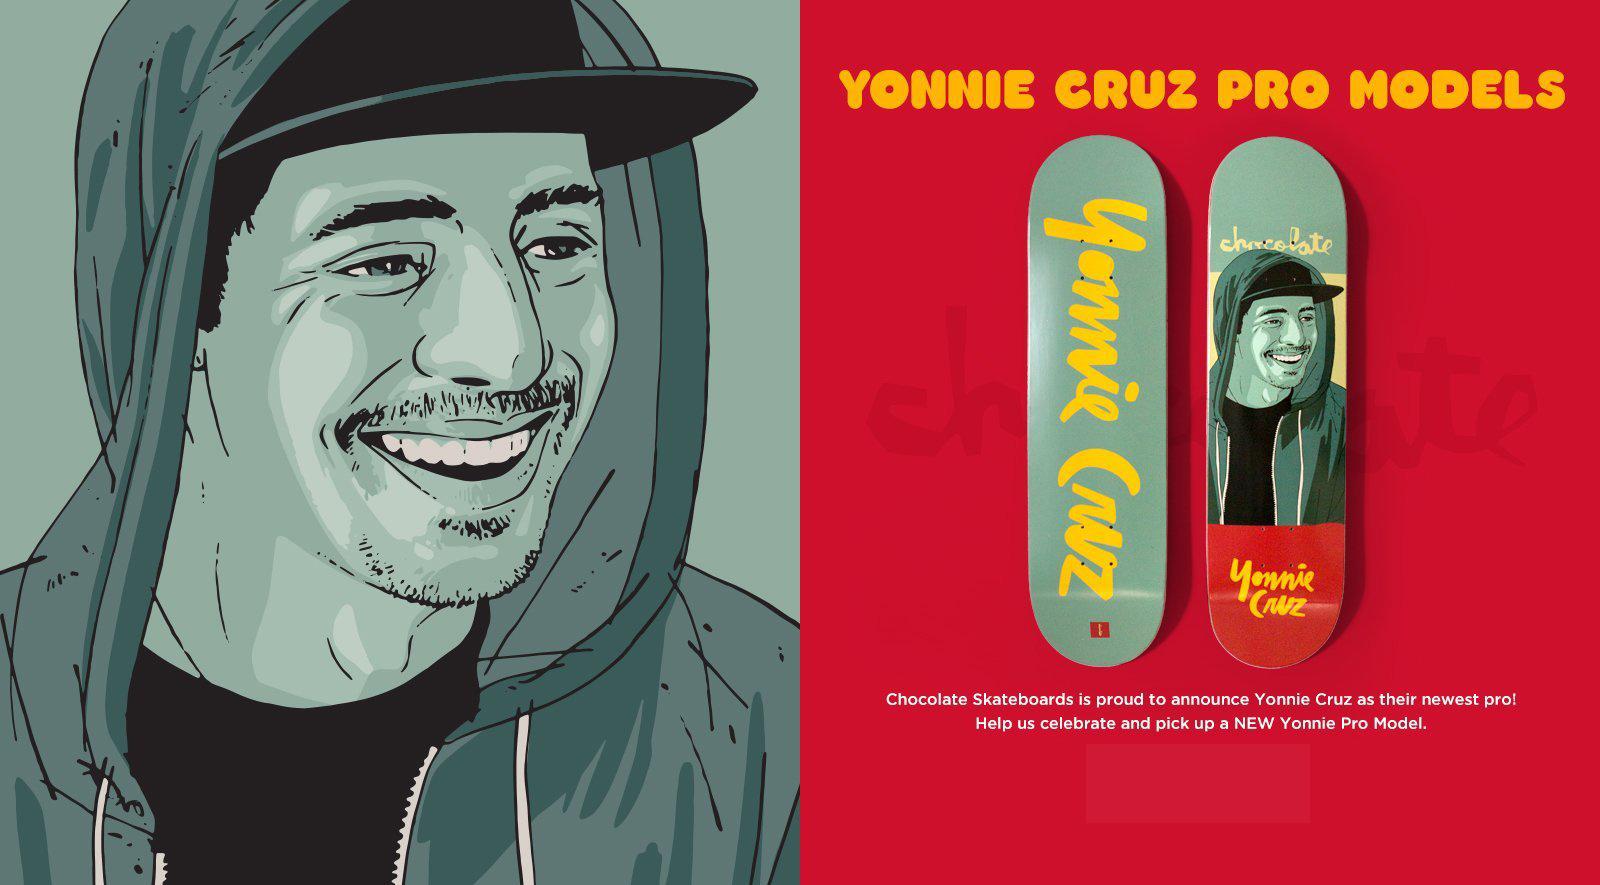 Yonnie-Cruz-Chocolate-Skate-Urban.jpg